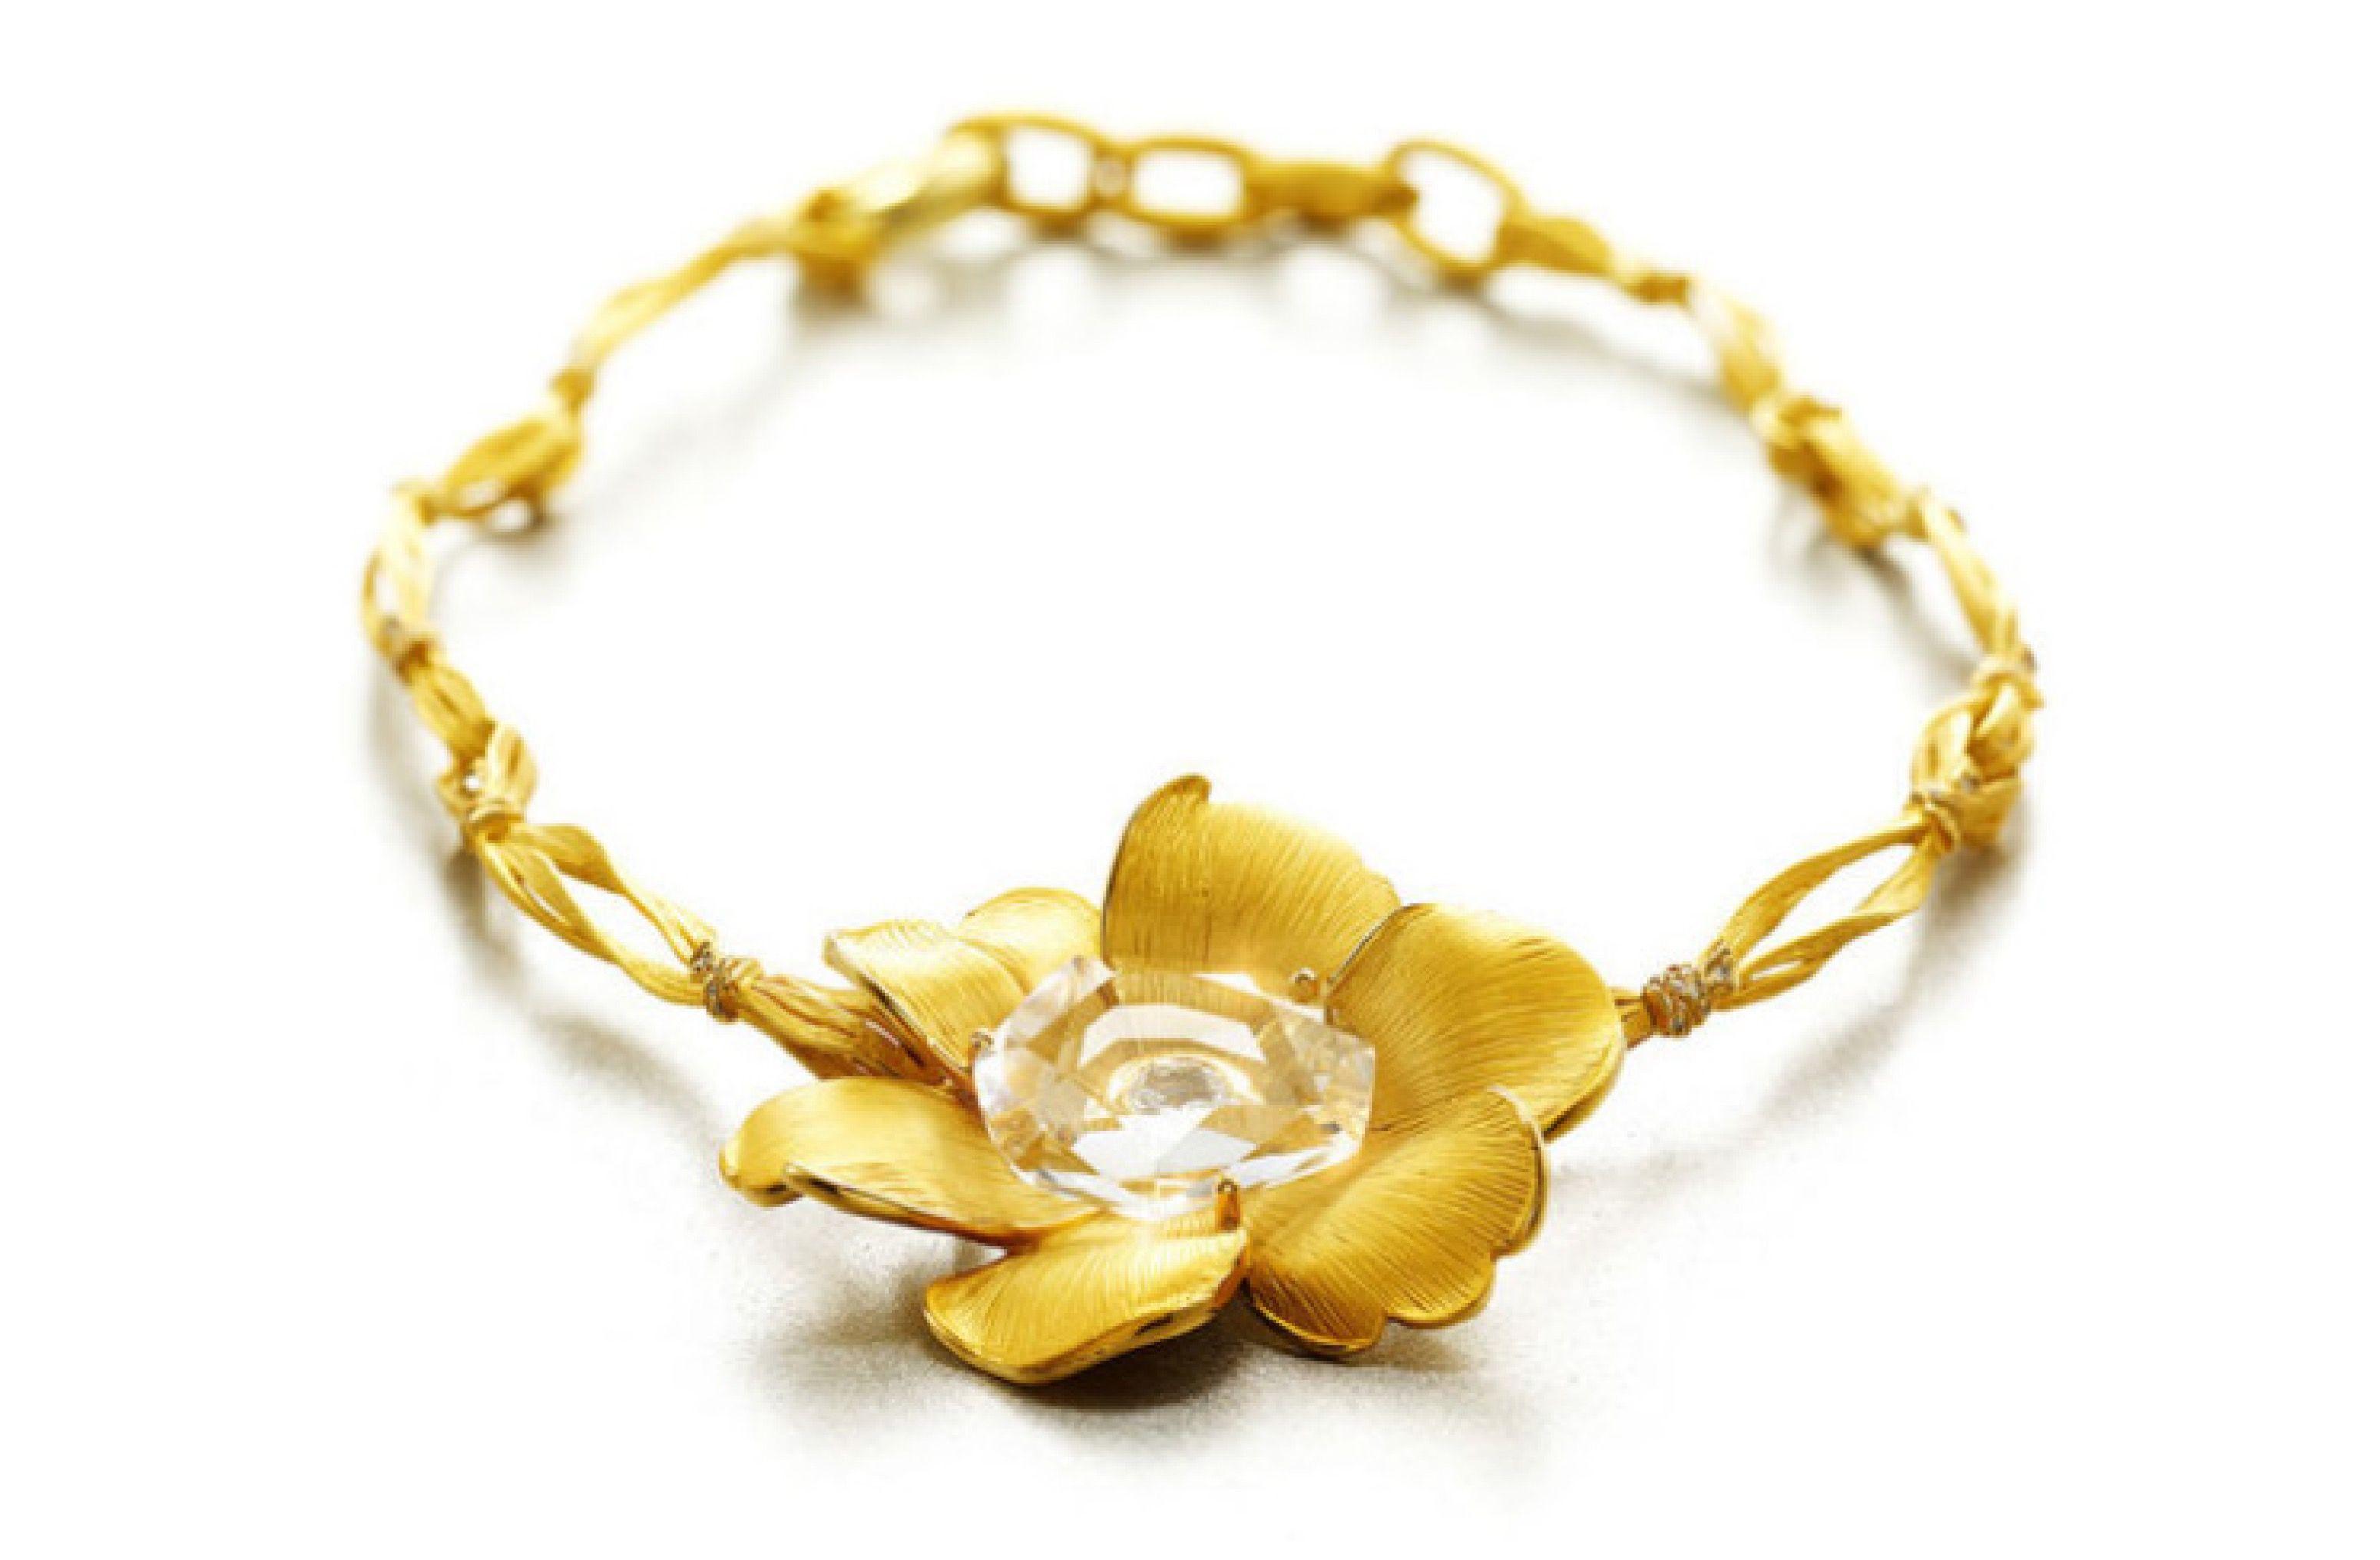 JewelryWhite_08.jpg